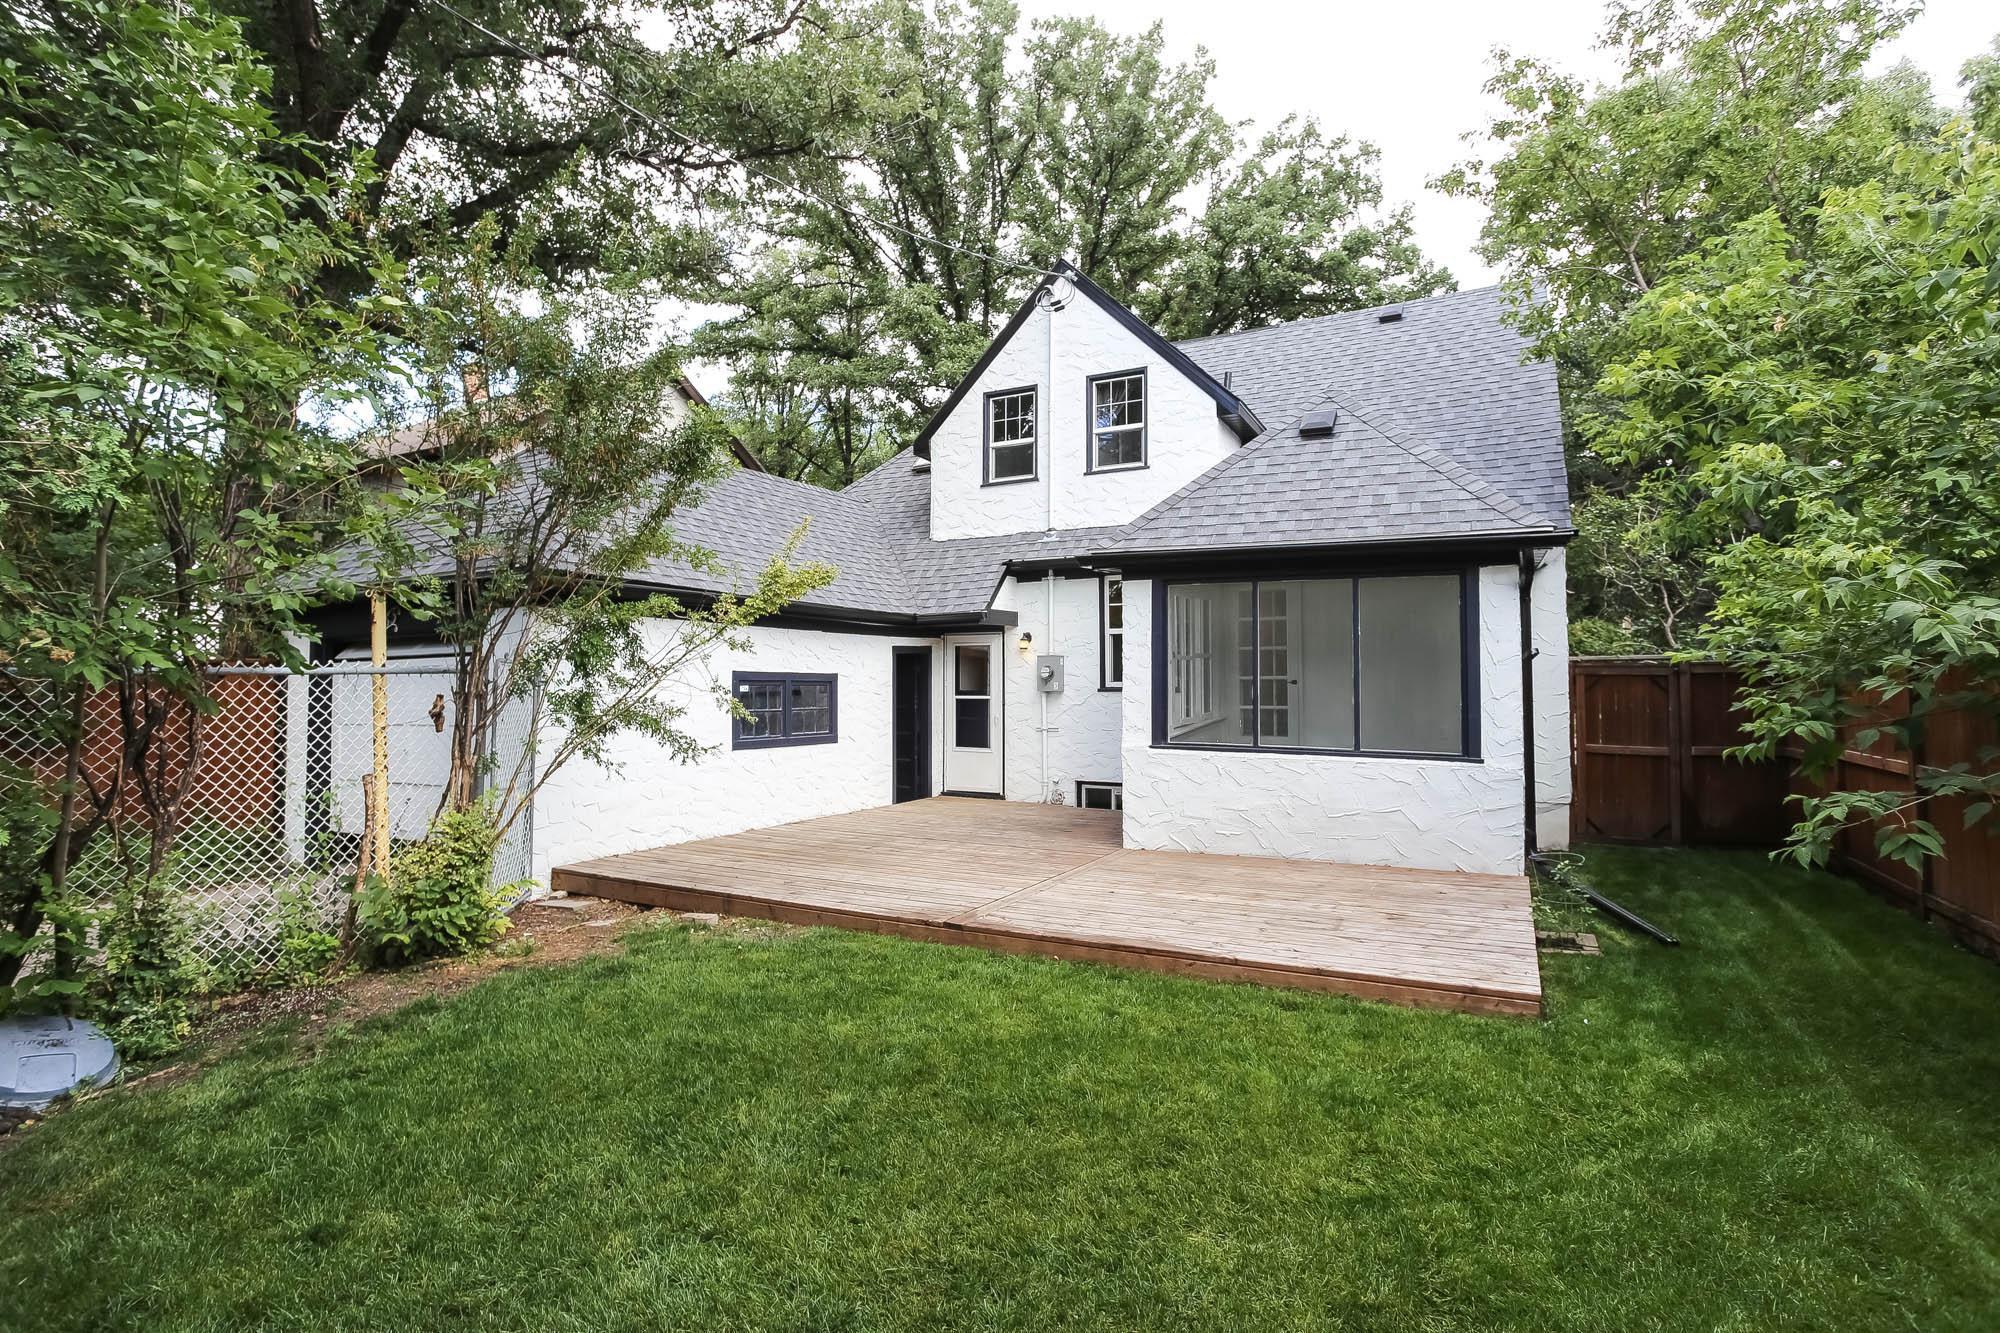 Photo 31: Photos: 155 Borebank Street in Winnipeg: River Heights Single Family Detached for sale (1C)  : MLS®# 202017166